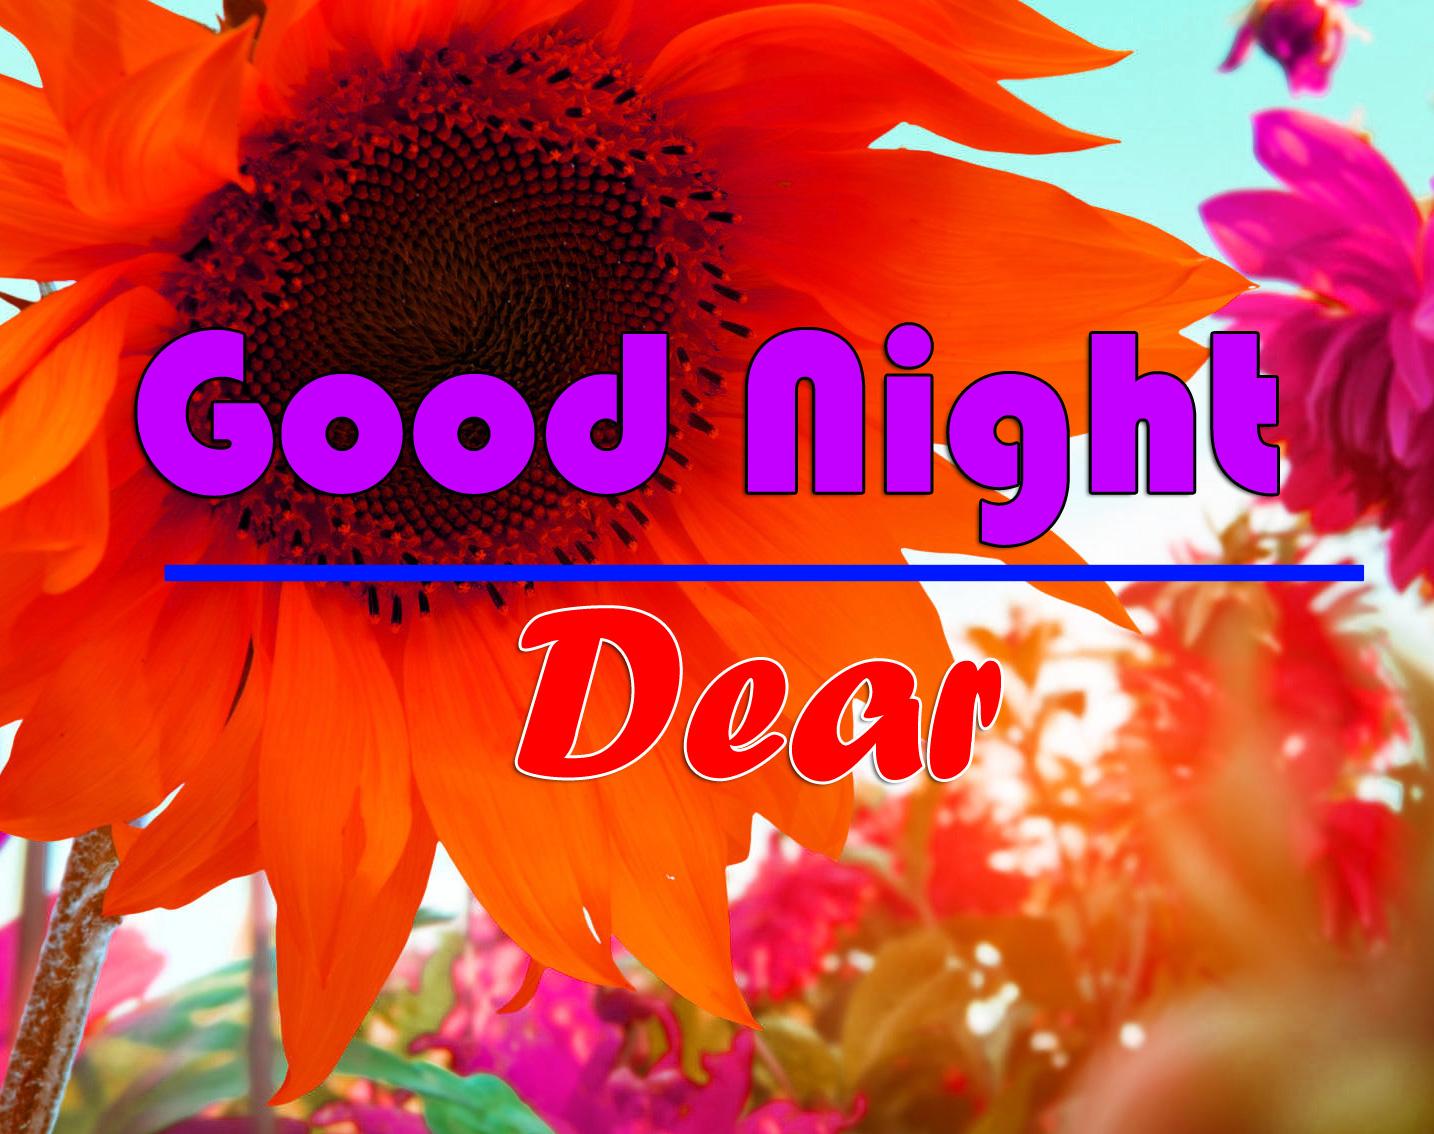 Good Night photo 5 1